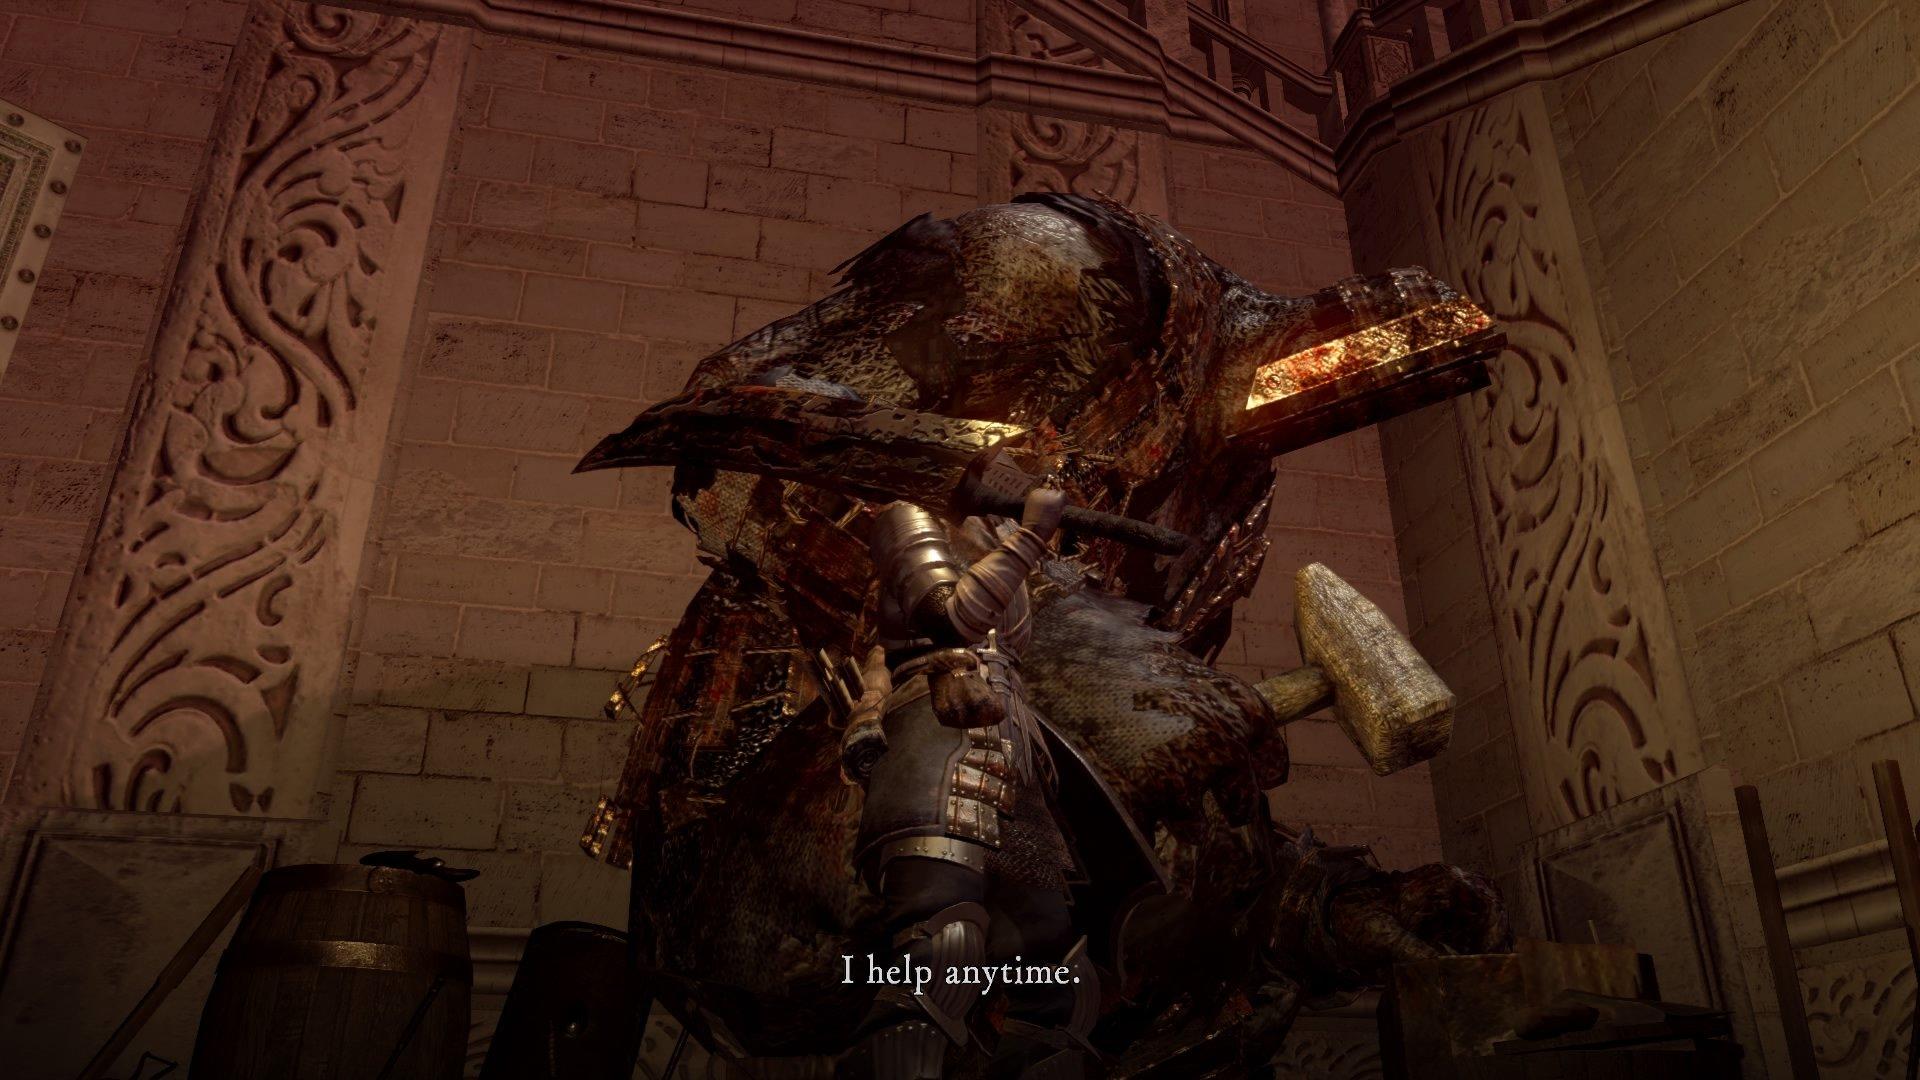 Giant Blacksmith Dark Souls Wiki